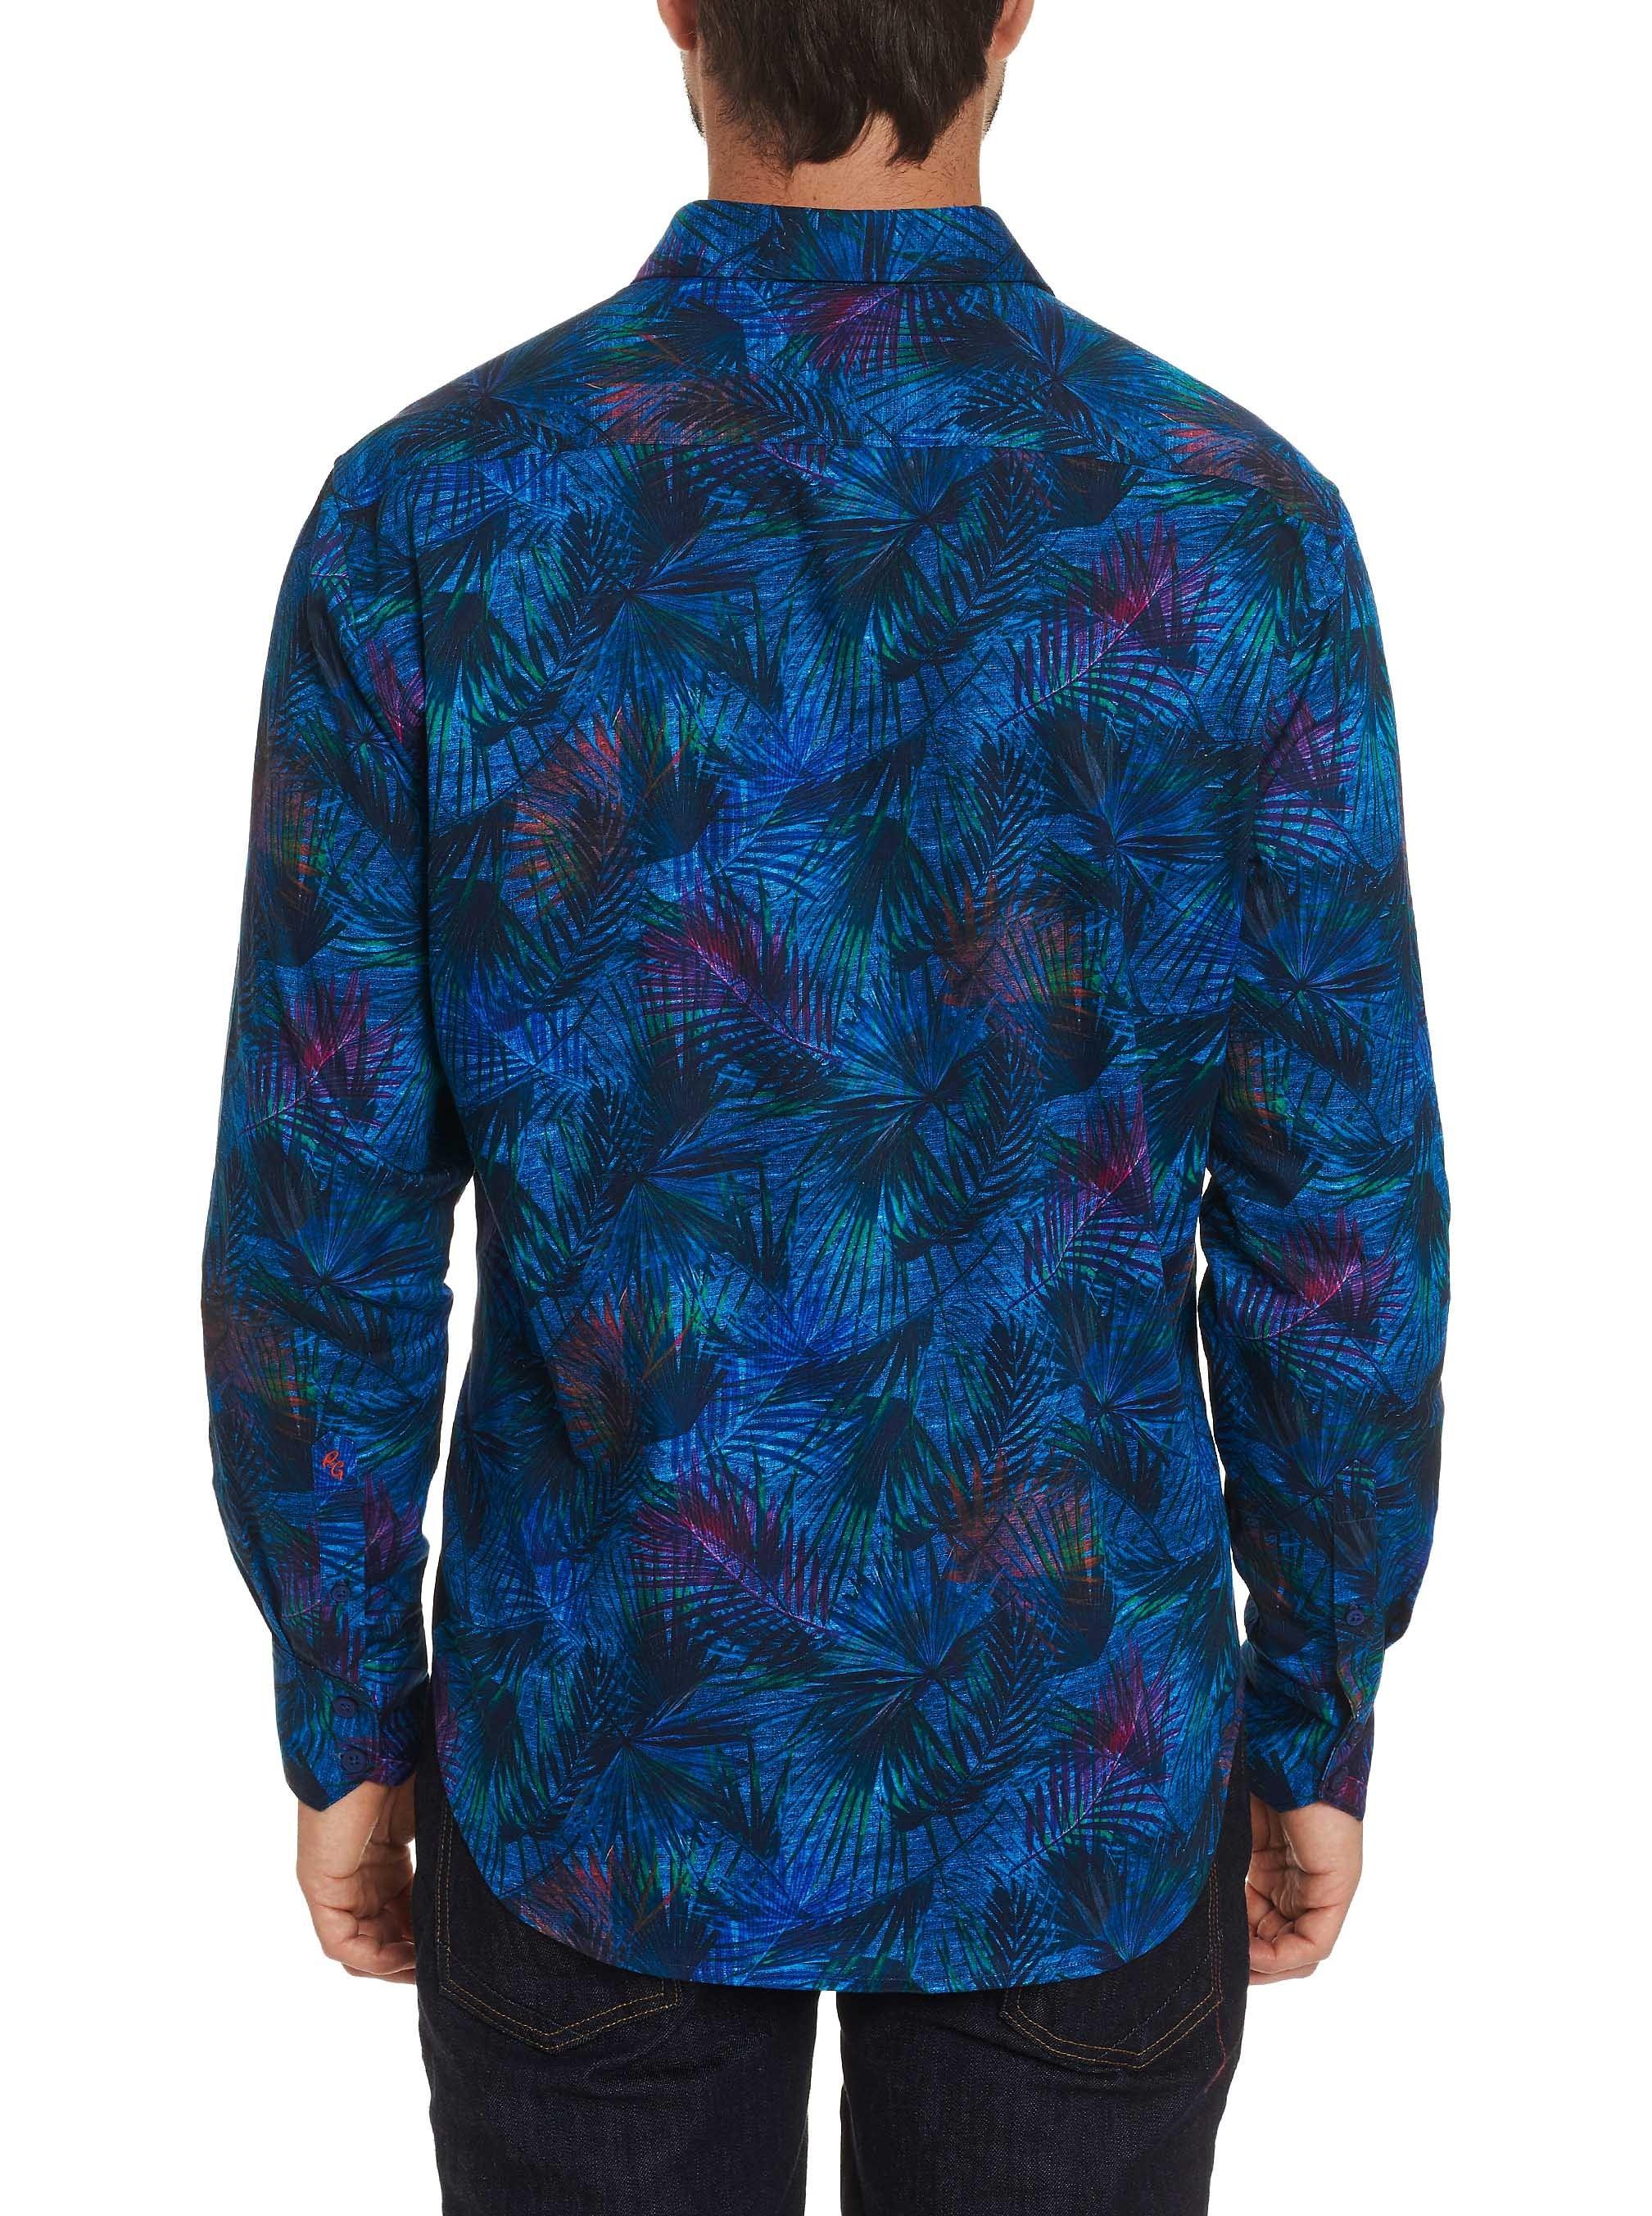 Robert Graham Leafy Dreams Sport Shirt Multi